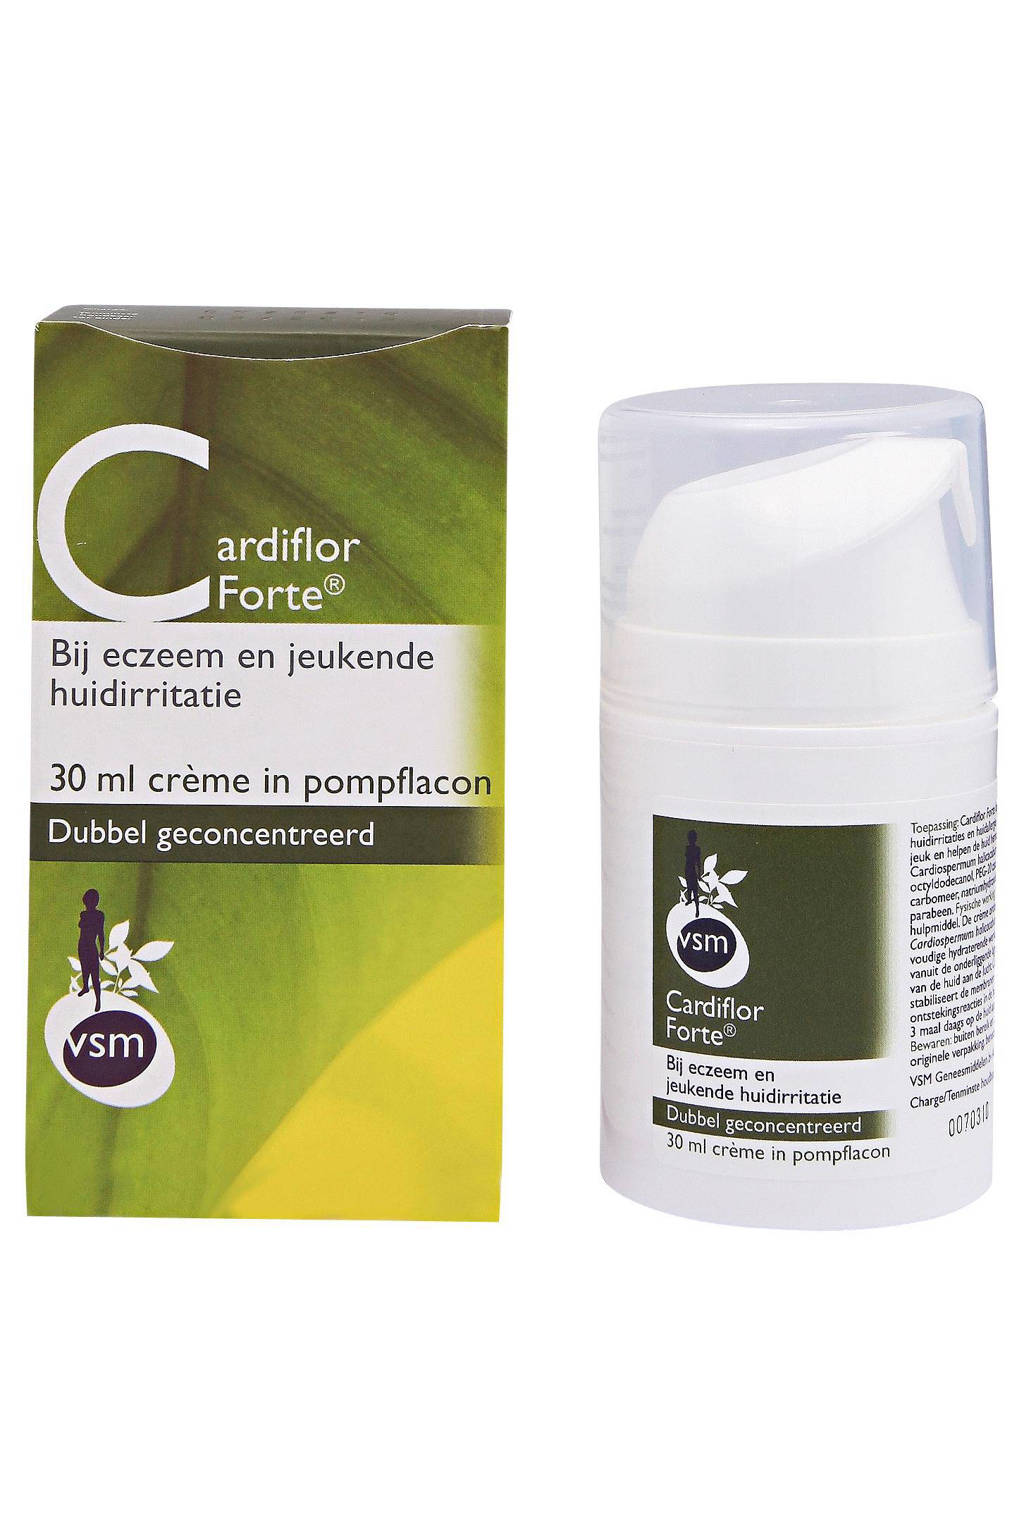 VSM Cardiflor Forte dubbel geconcentreerde crème - 30 ml